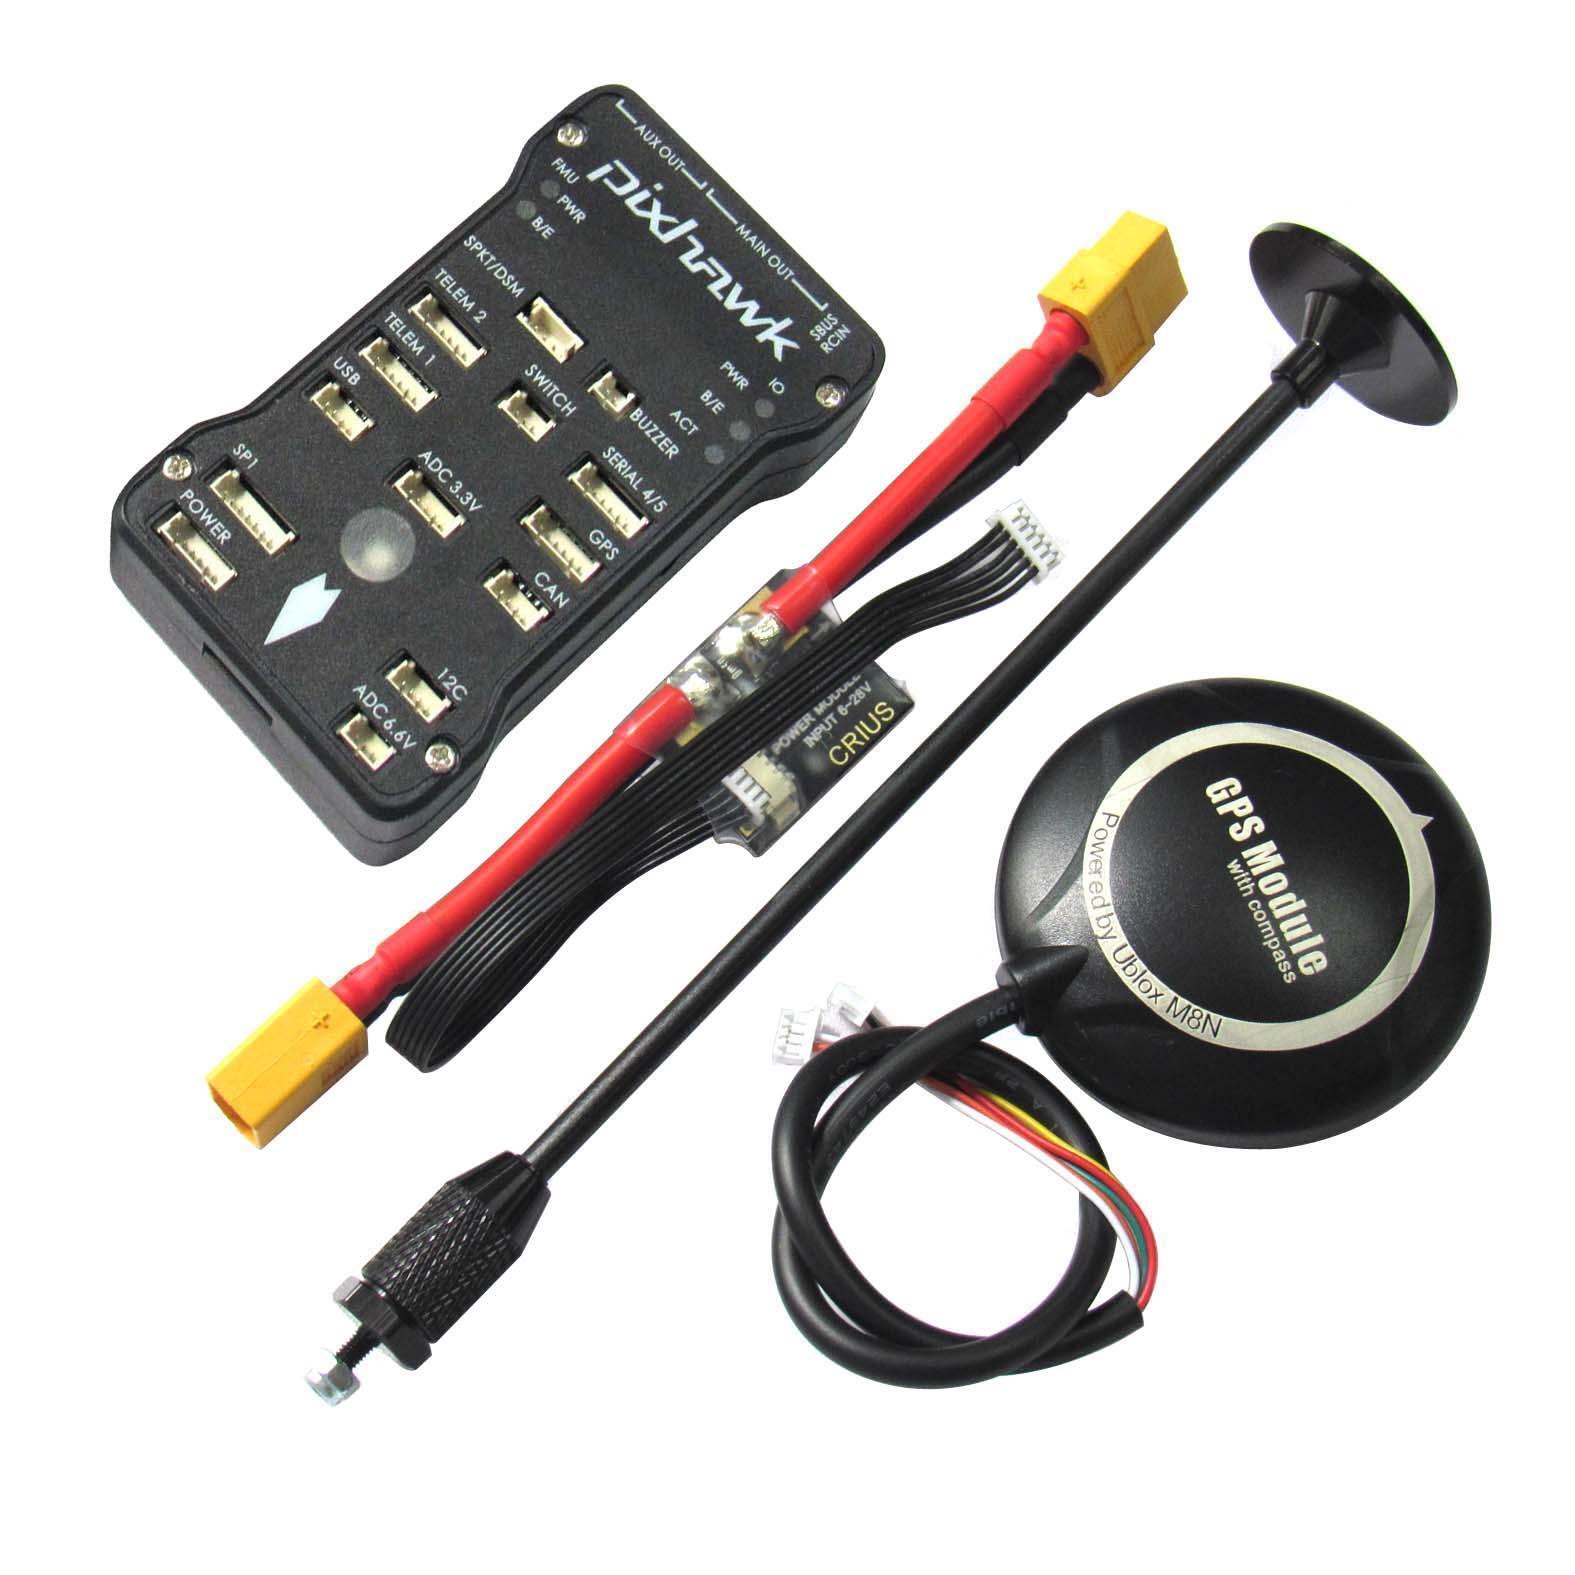 Pixhawk px4 v2.4.8 32bit Flight Controller neo-m8n GPS Power módulos Multicopter